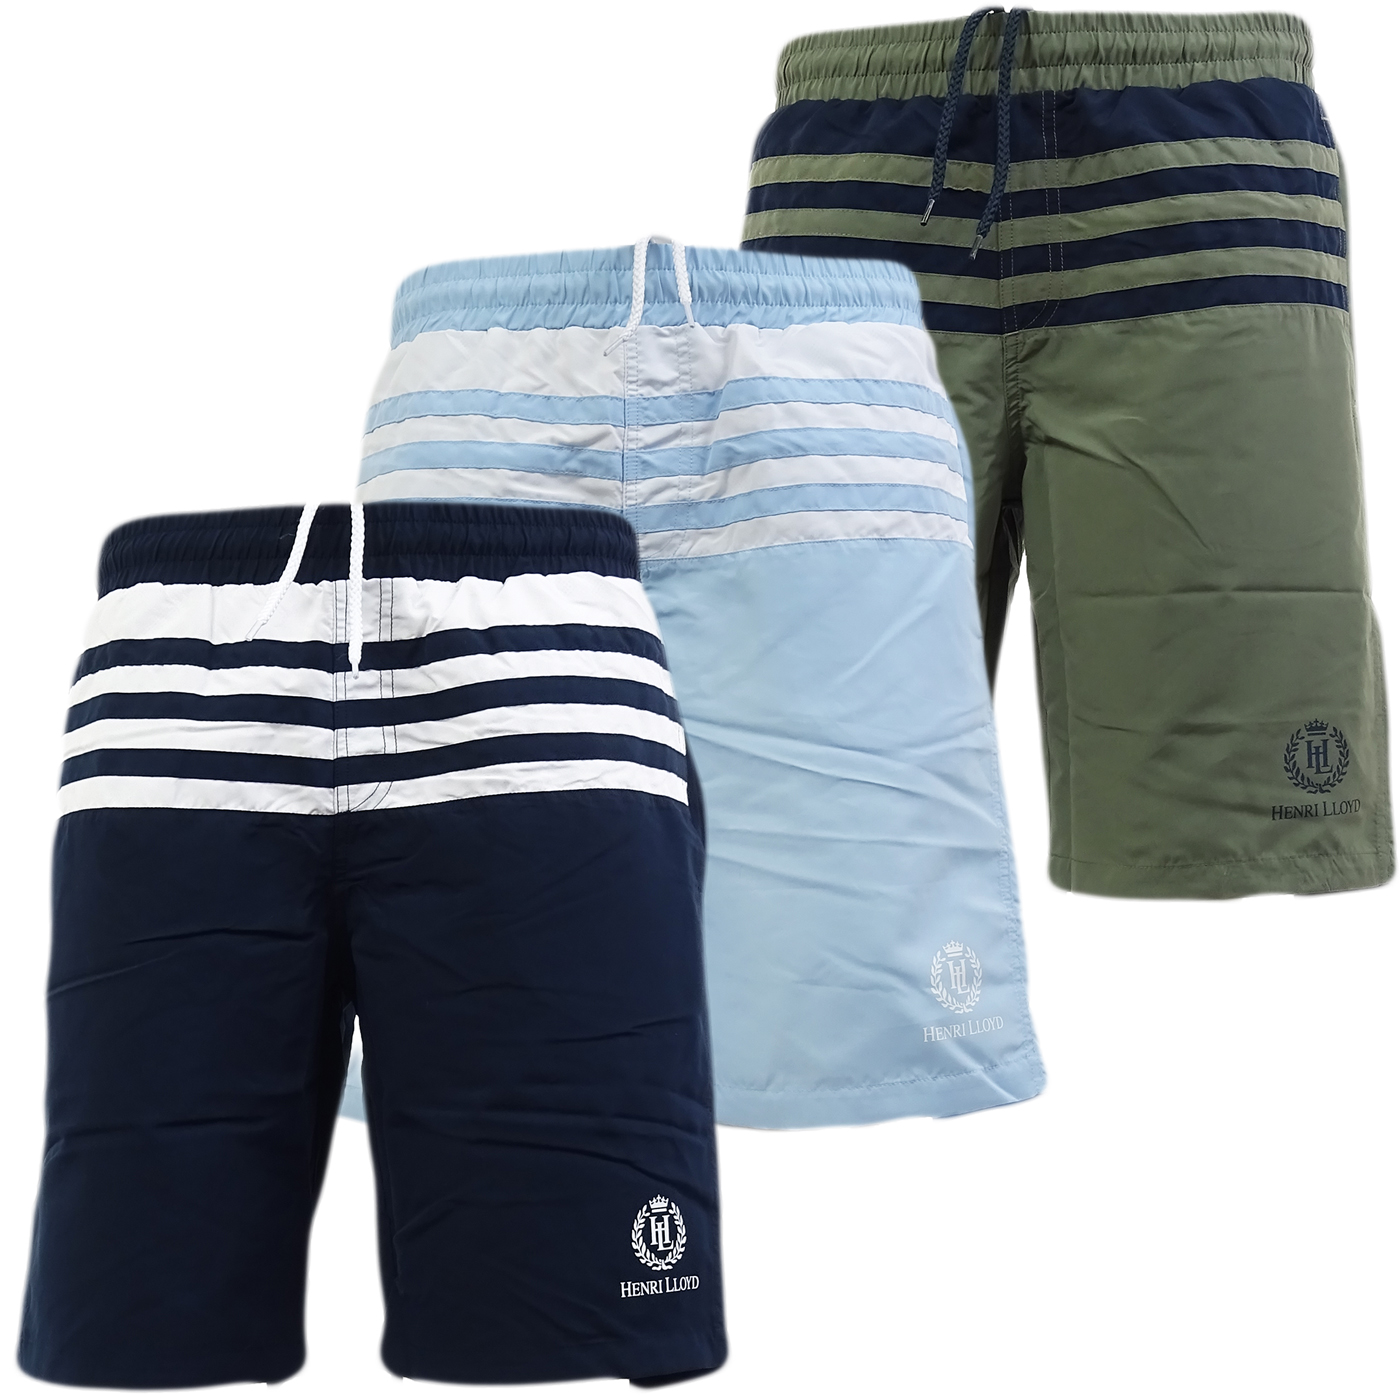 Henri Lloyd Mesh Lined Swim Short Shorts Nes